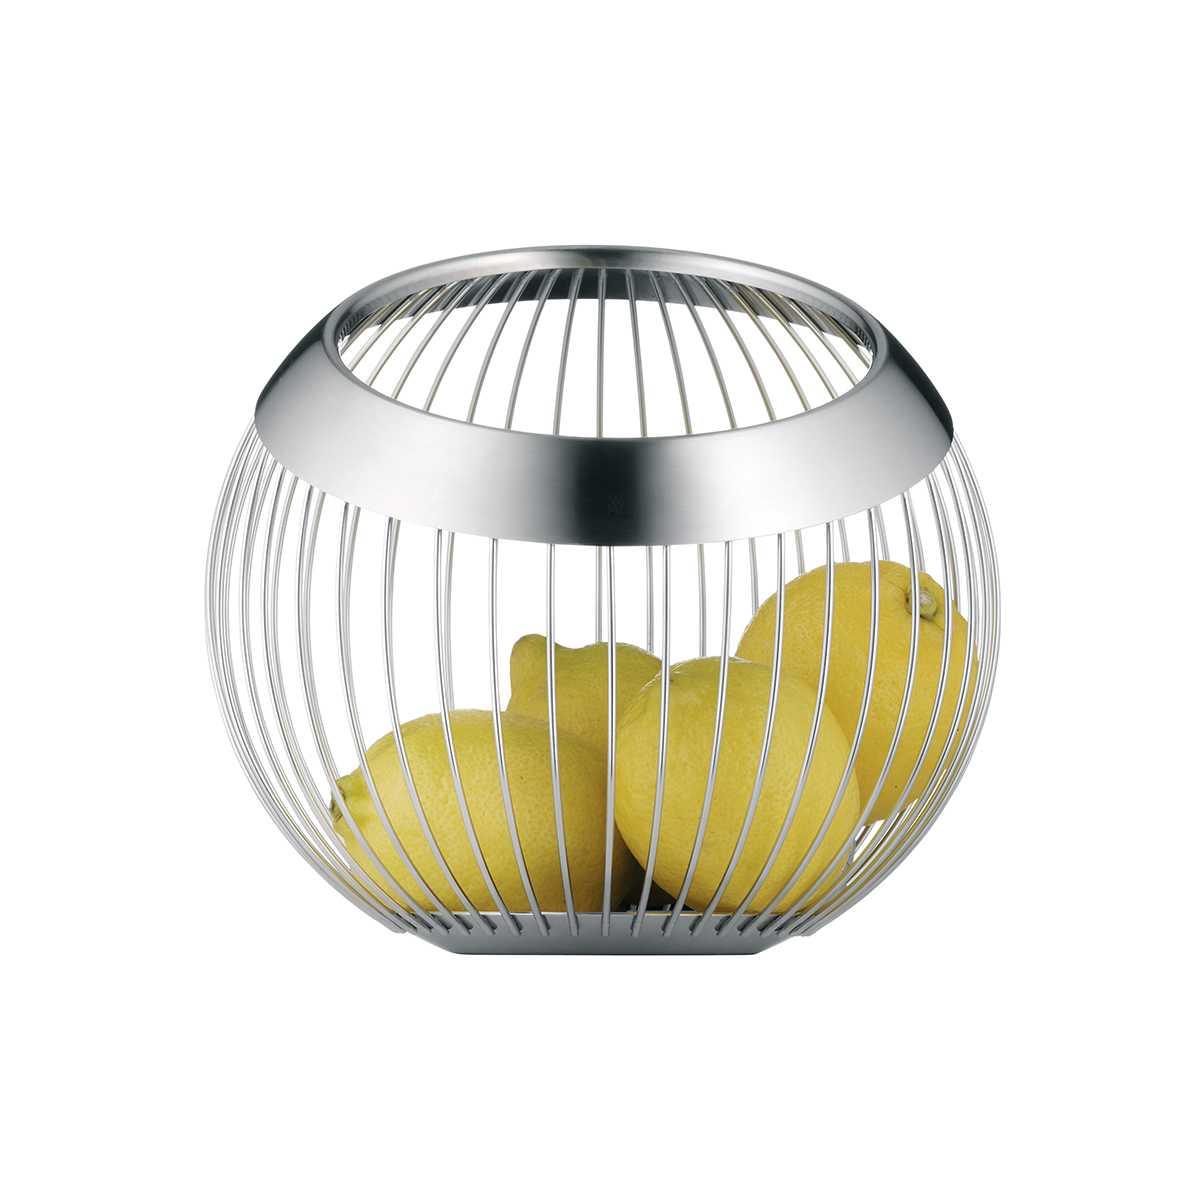 Корзина WMF HOME DECOR, диаметр 13 см, ширина 18,5 см, серебристый WMF 06 6507 6030 фото 1